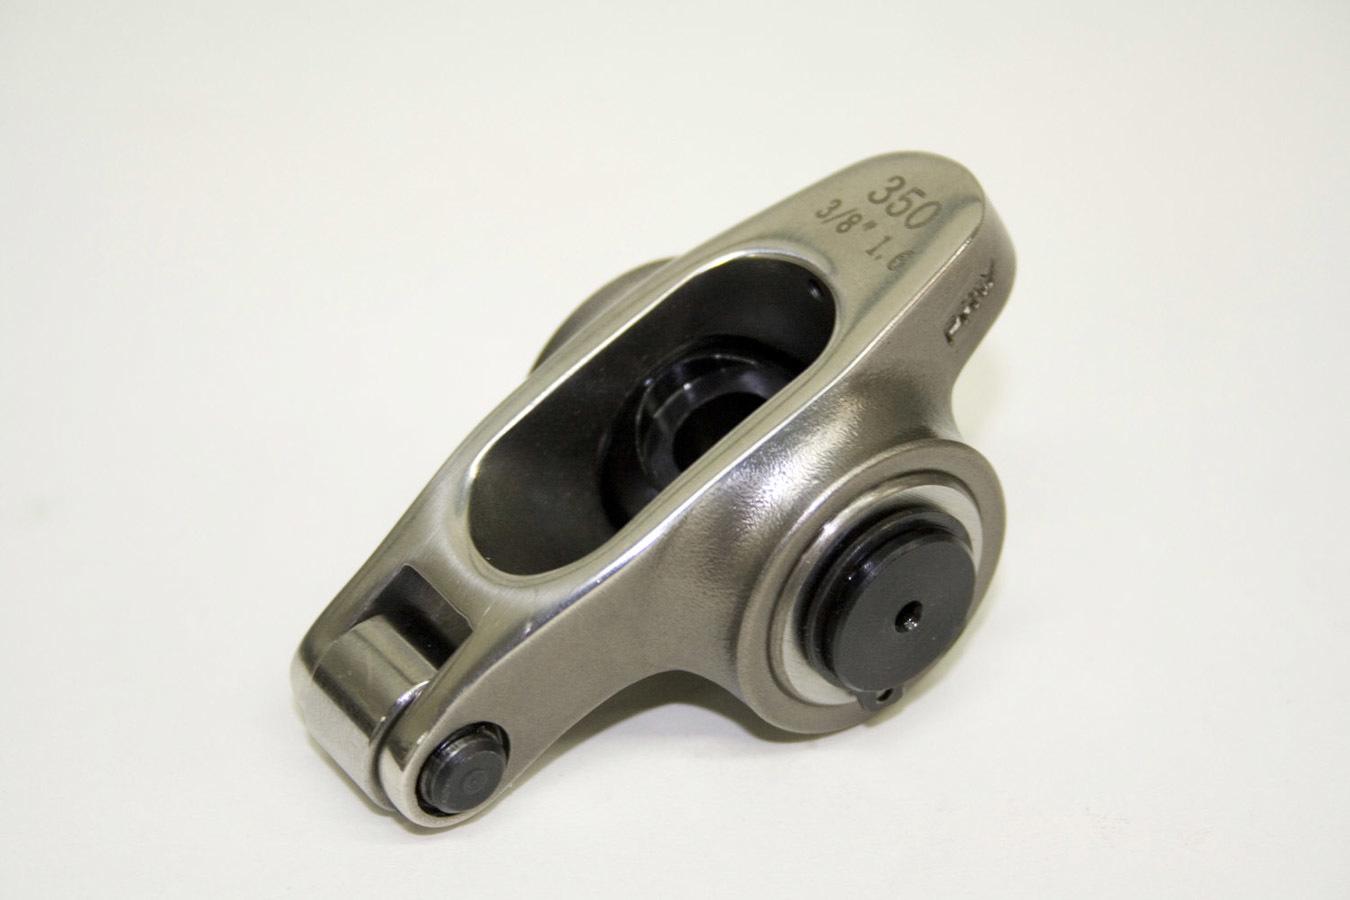 SBC S/S Roller R/A's - 1.5 Ratio 7/16 Stud